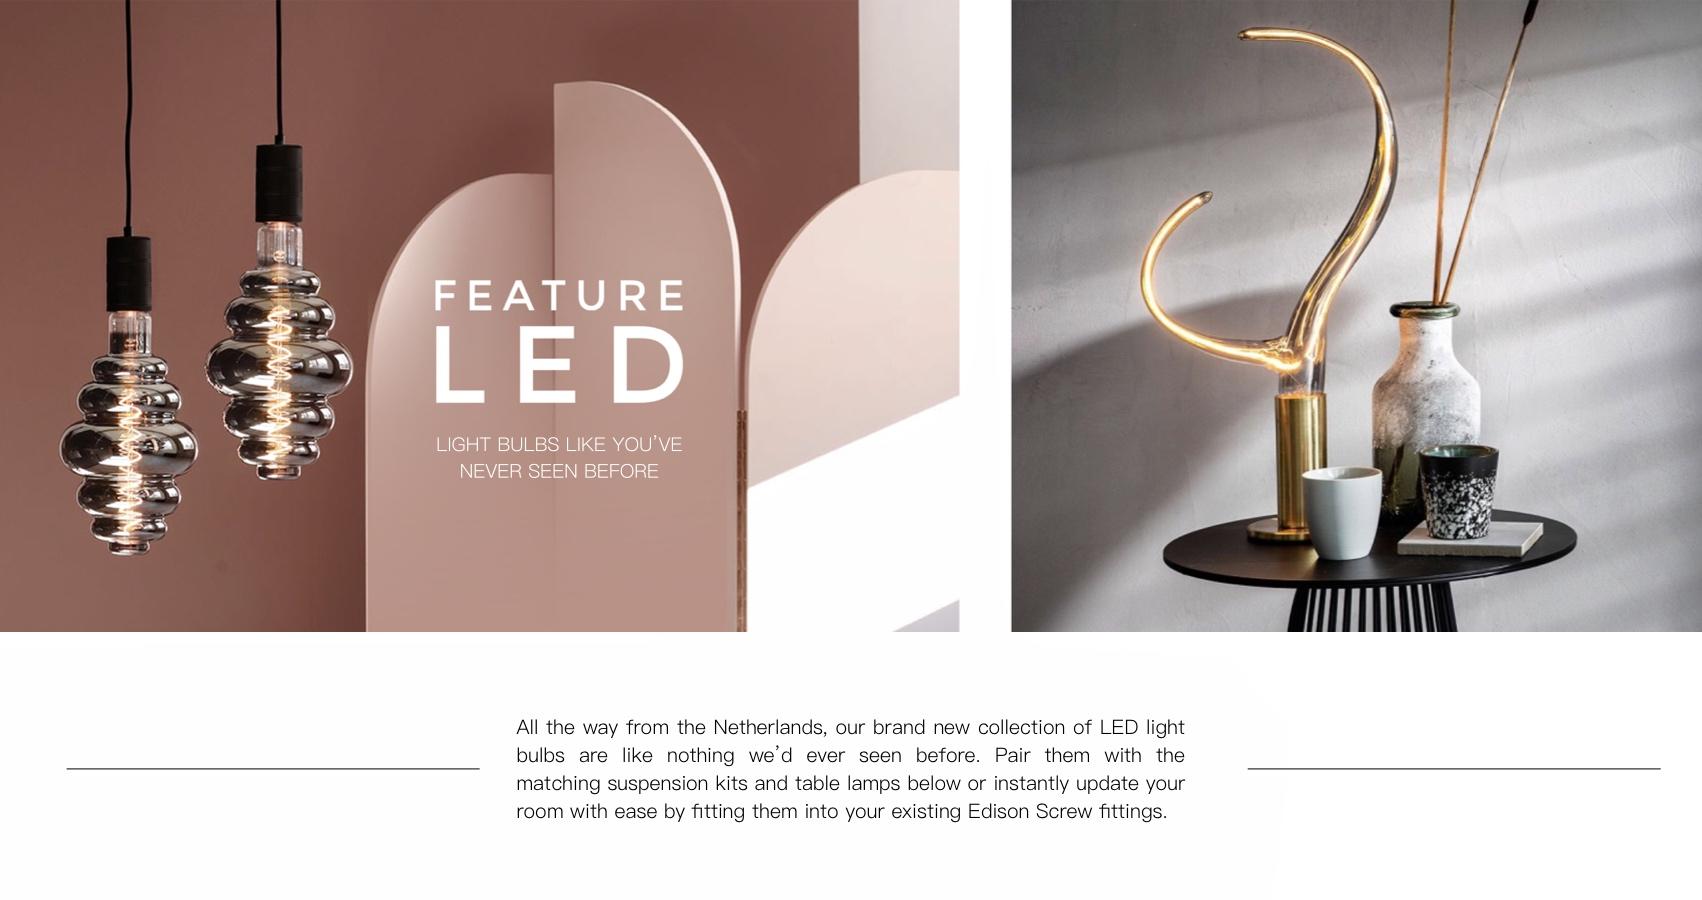 Feature LED Light Bulbs